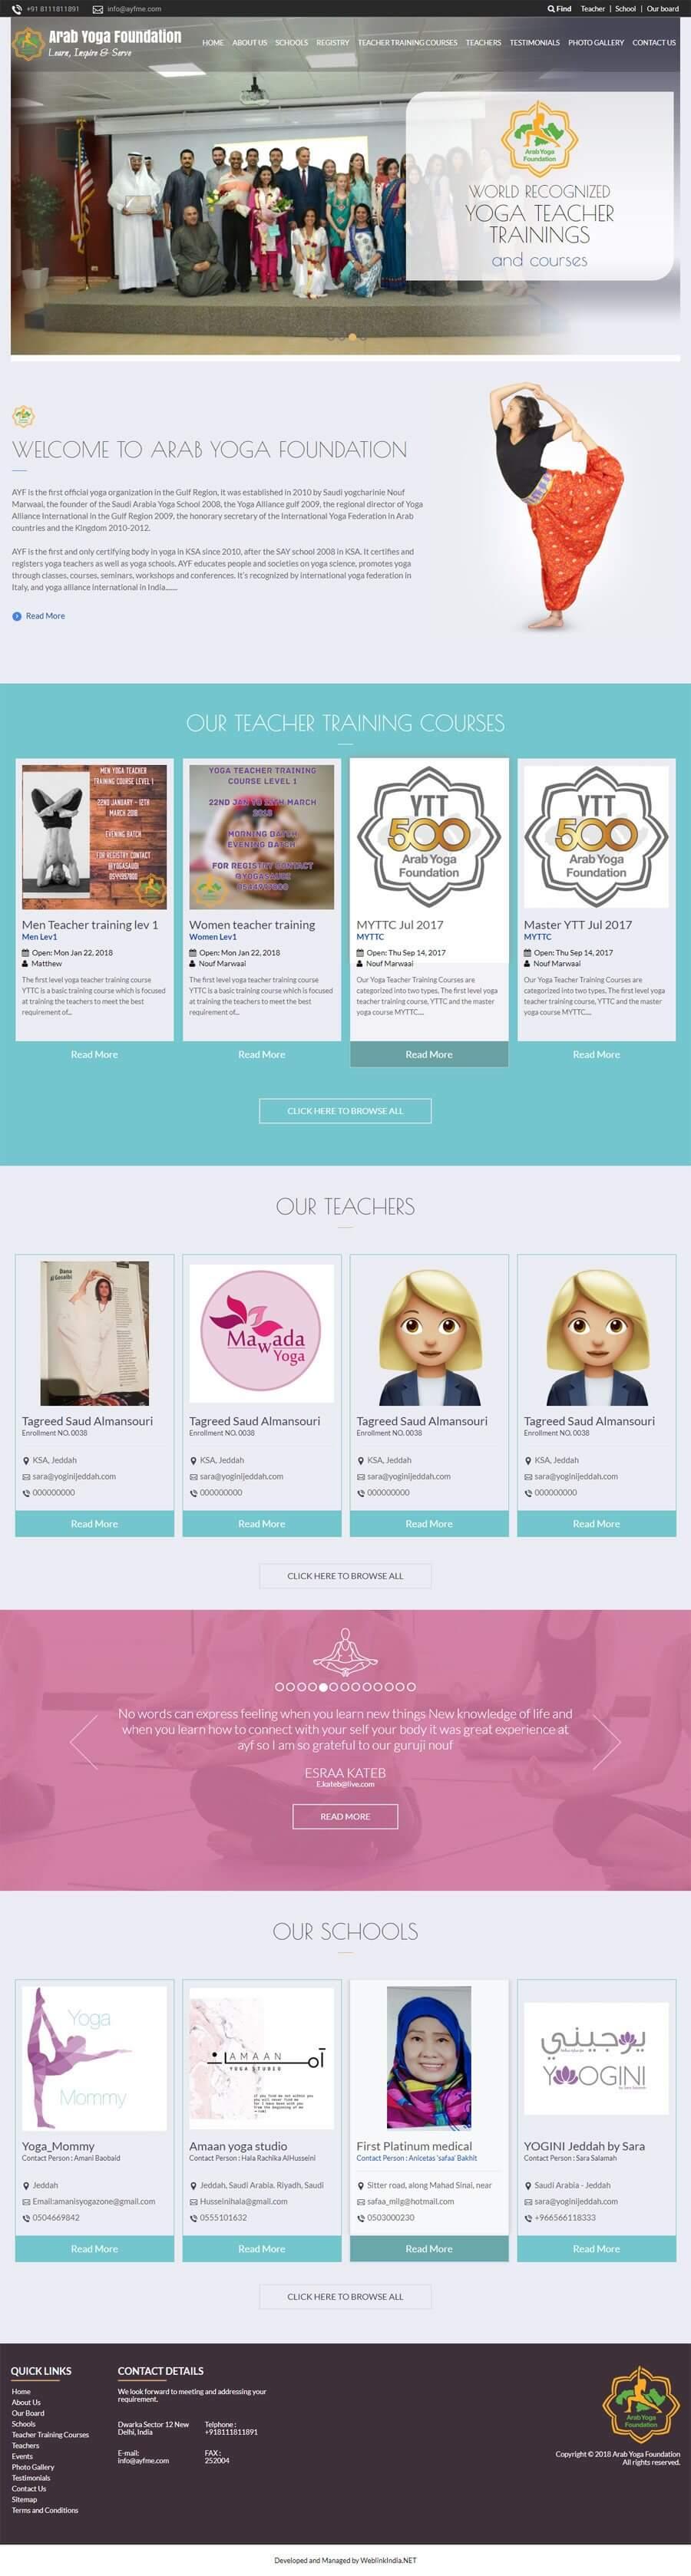 Arab Yoga Foundation - Web Design Portfolio